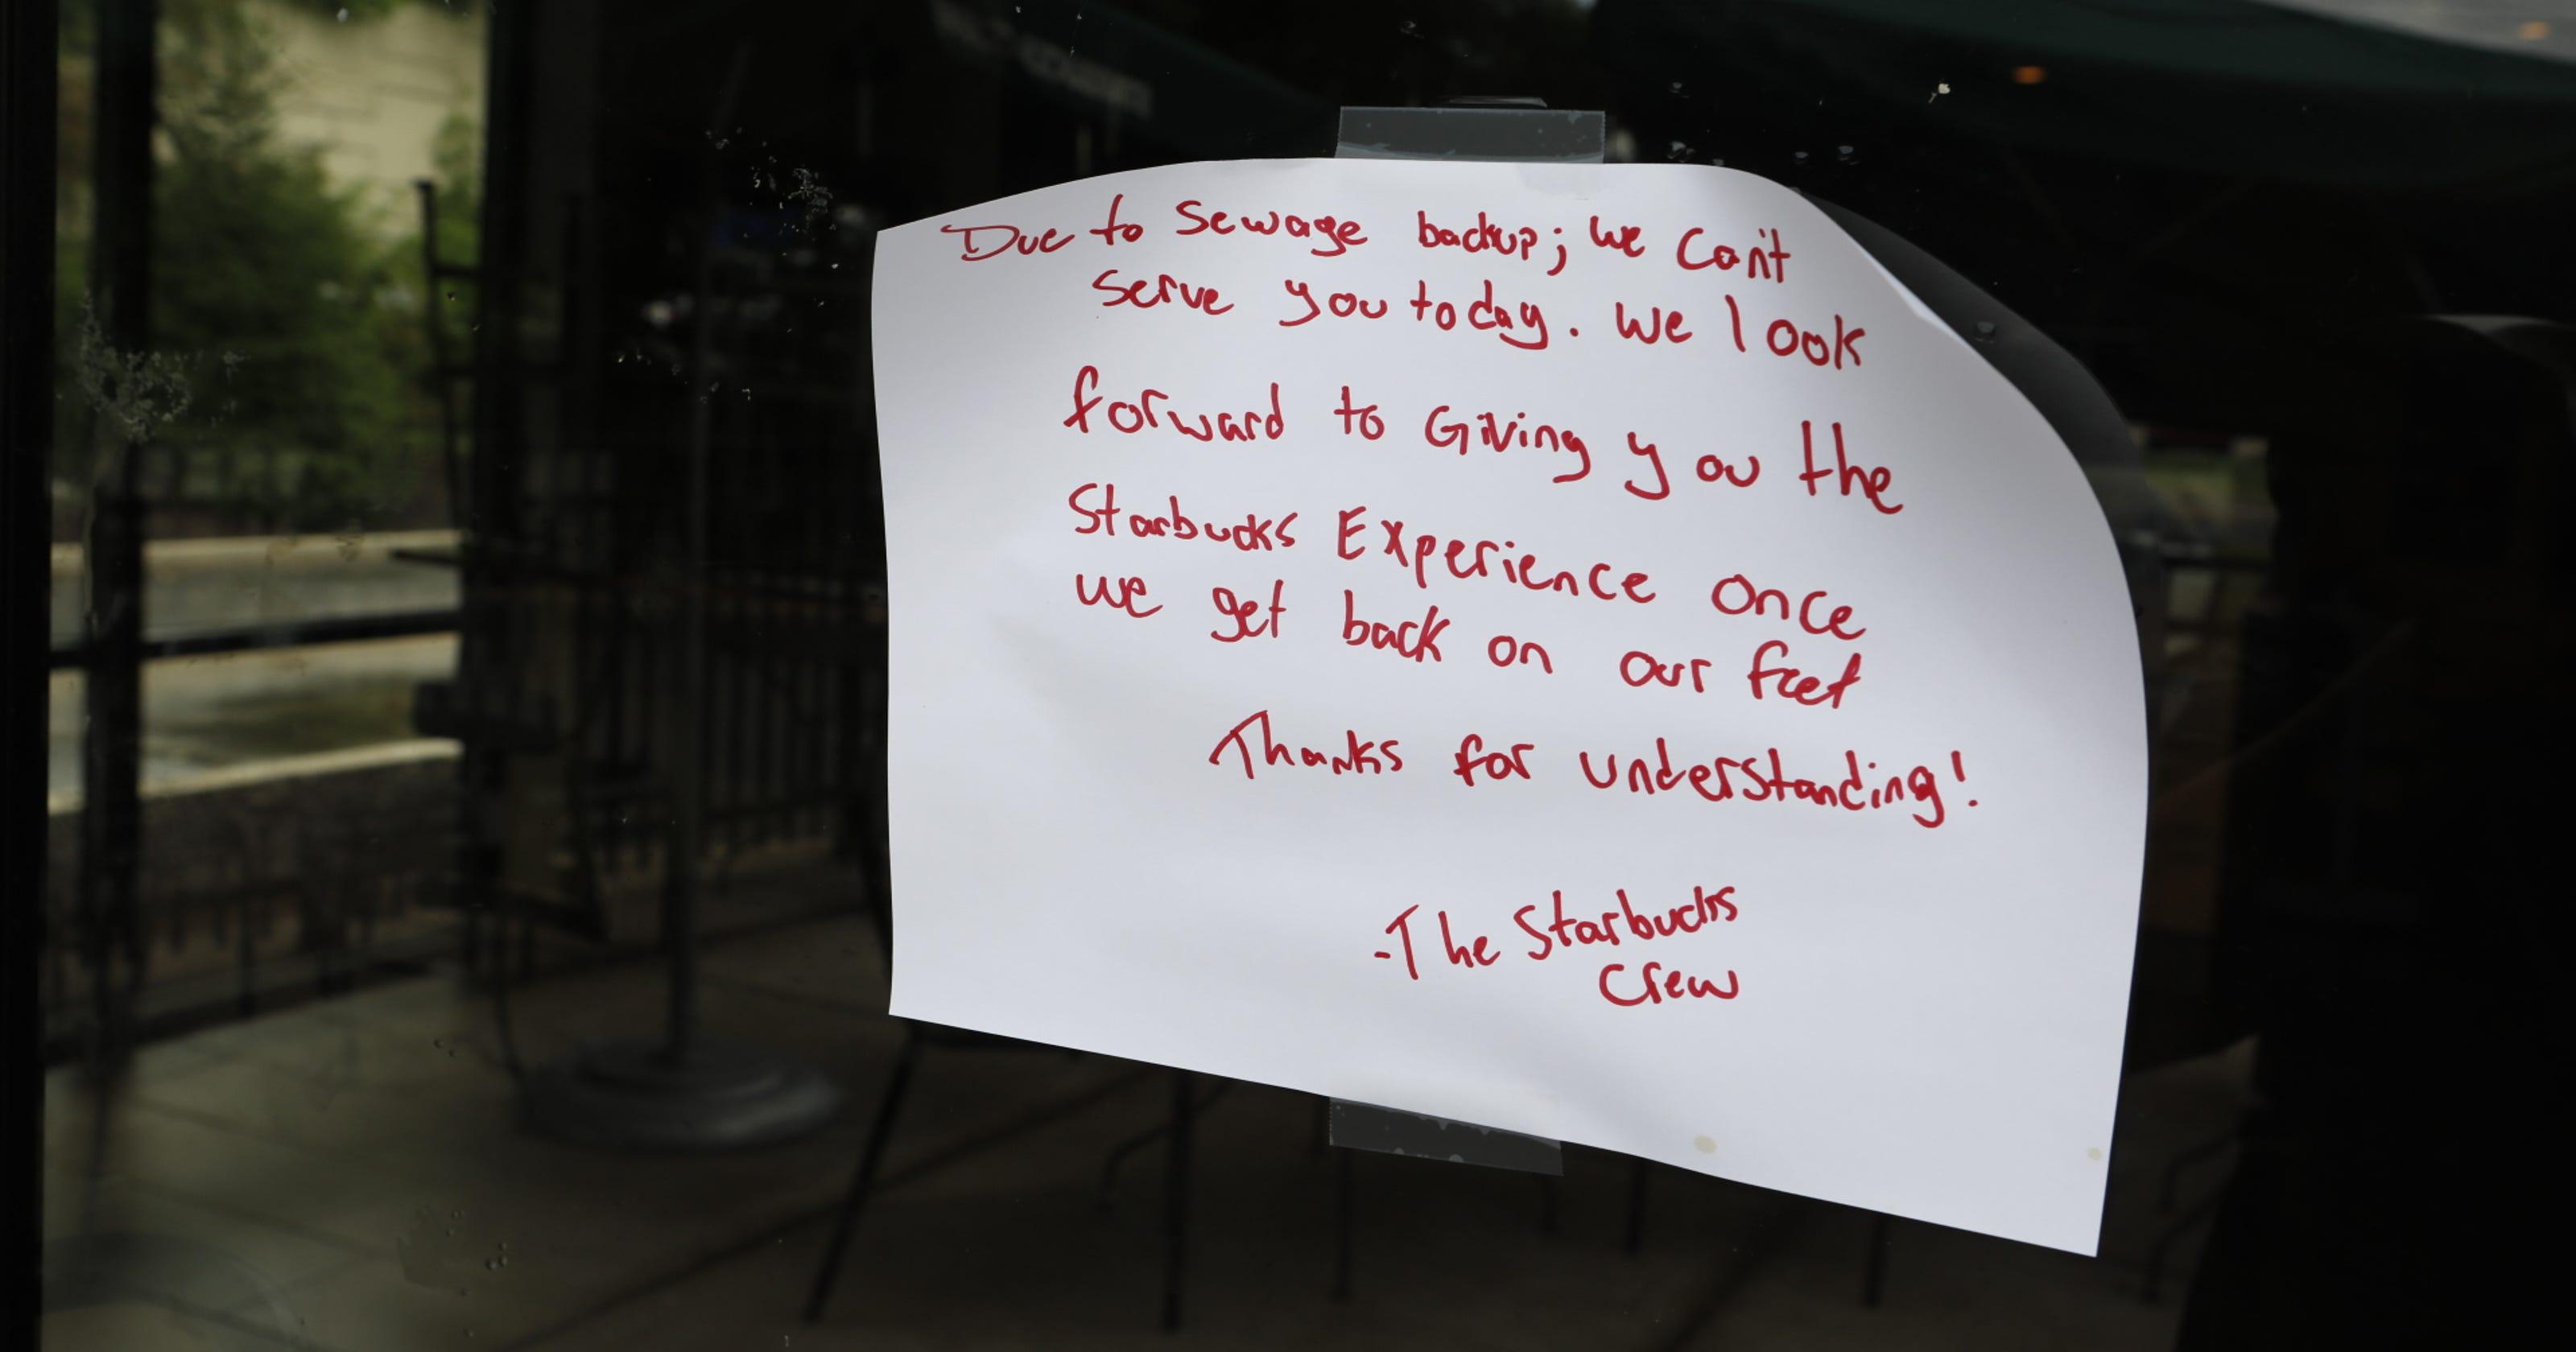 Sewage spill closes Cortlandt Starbucks